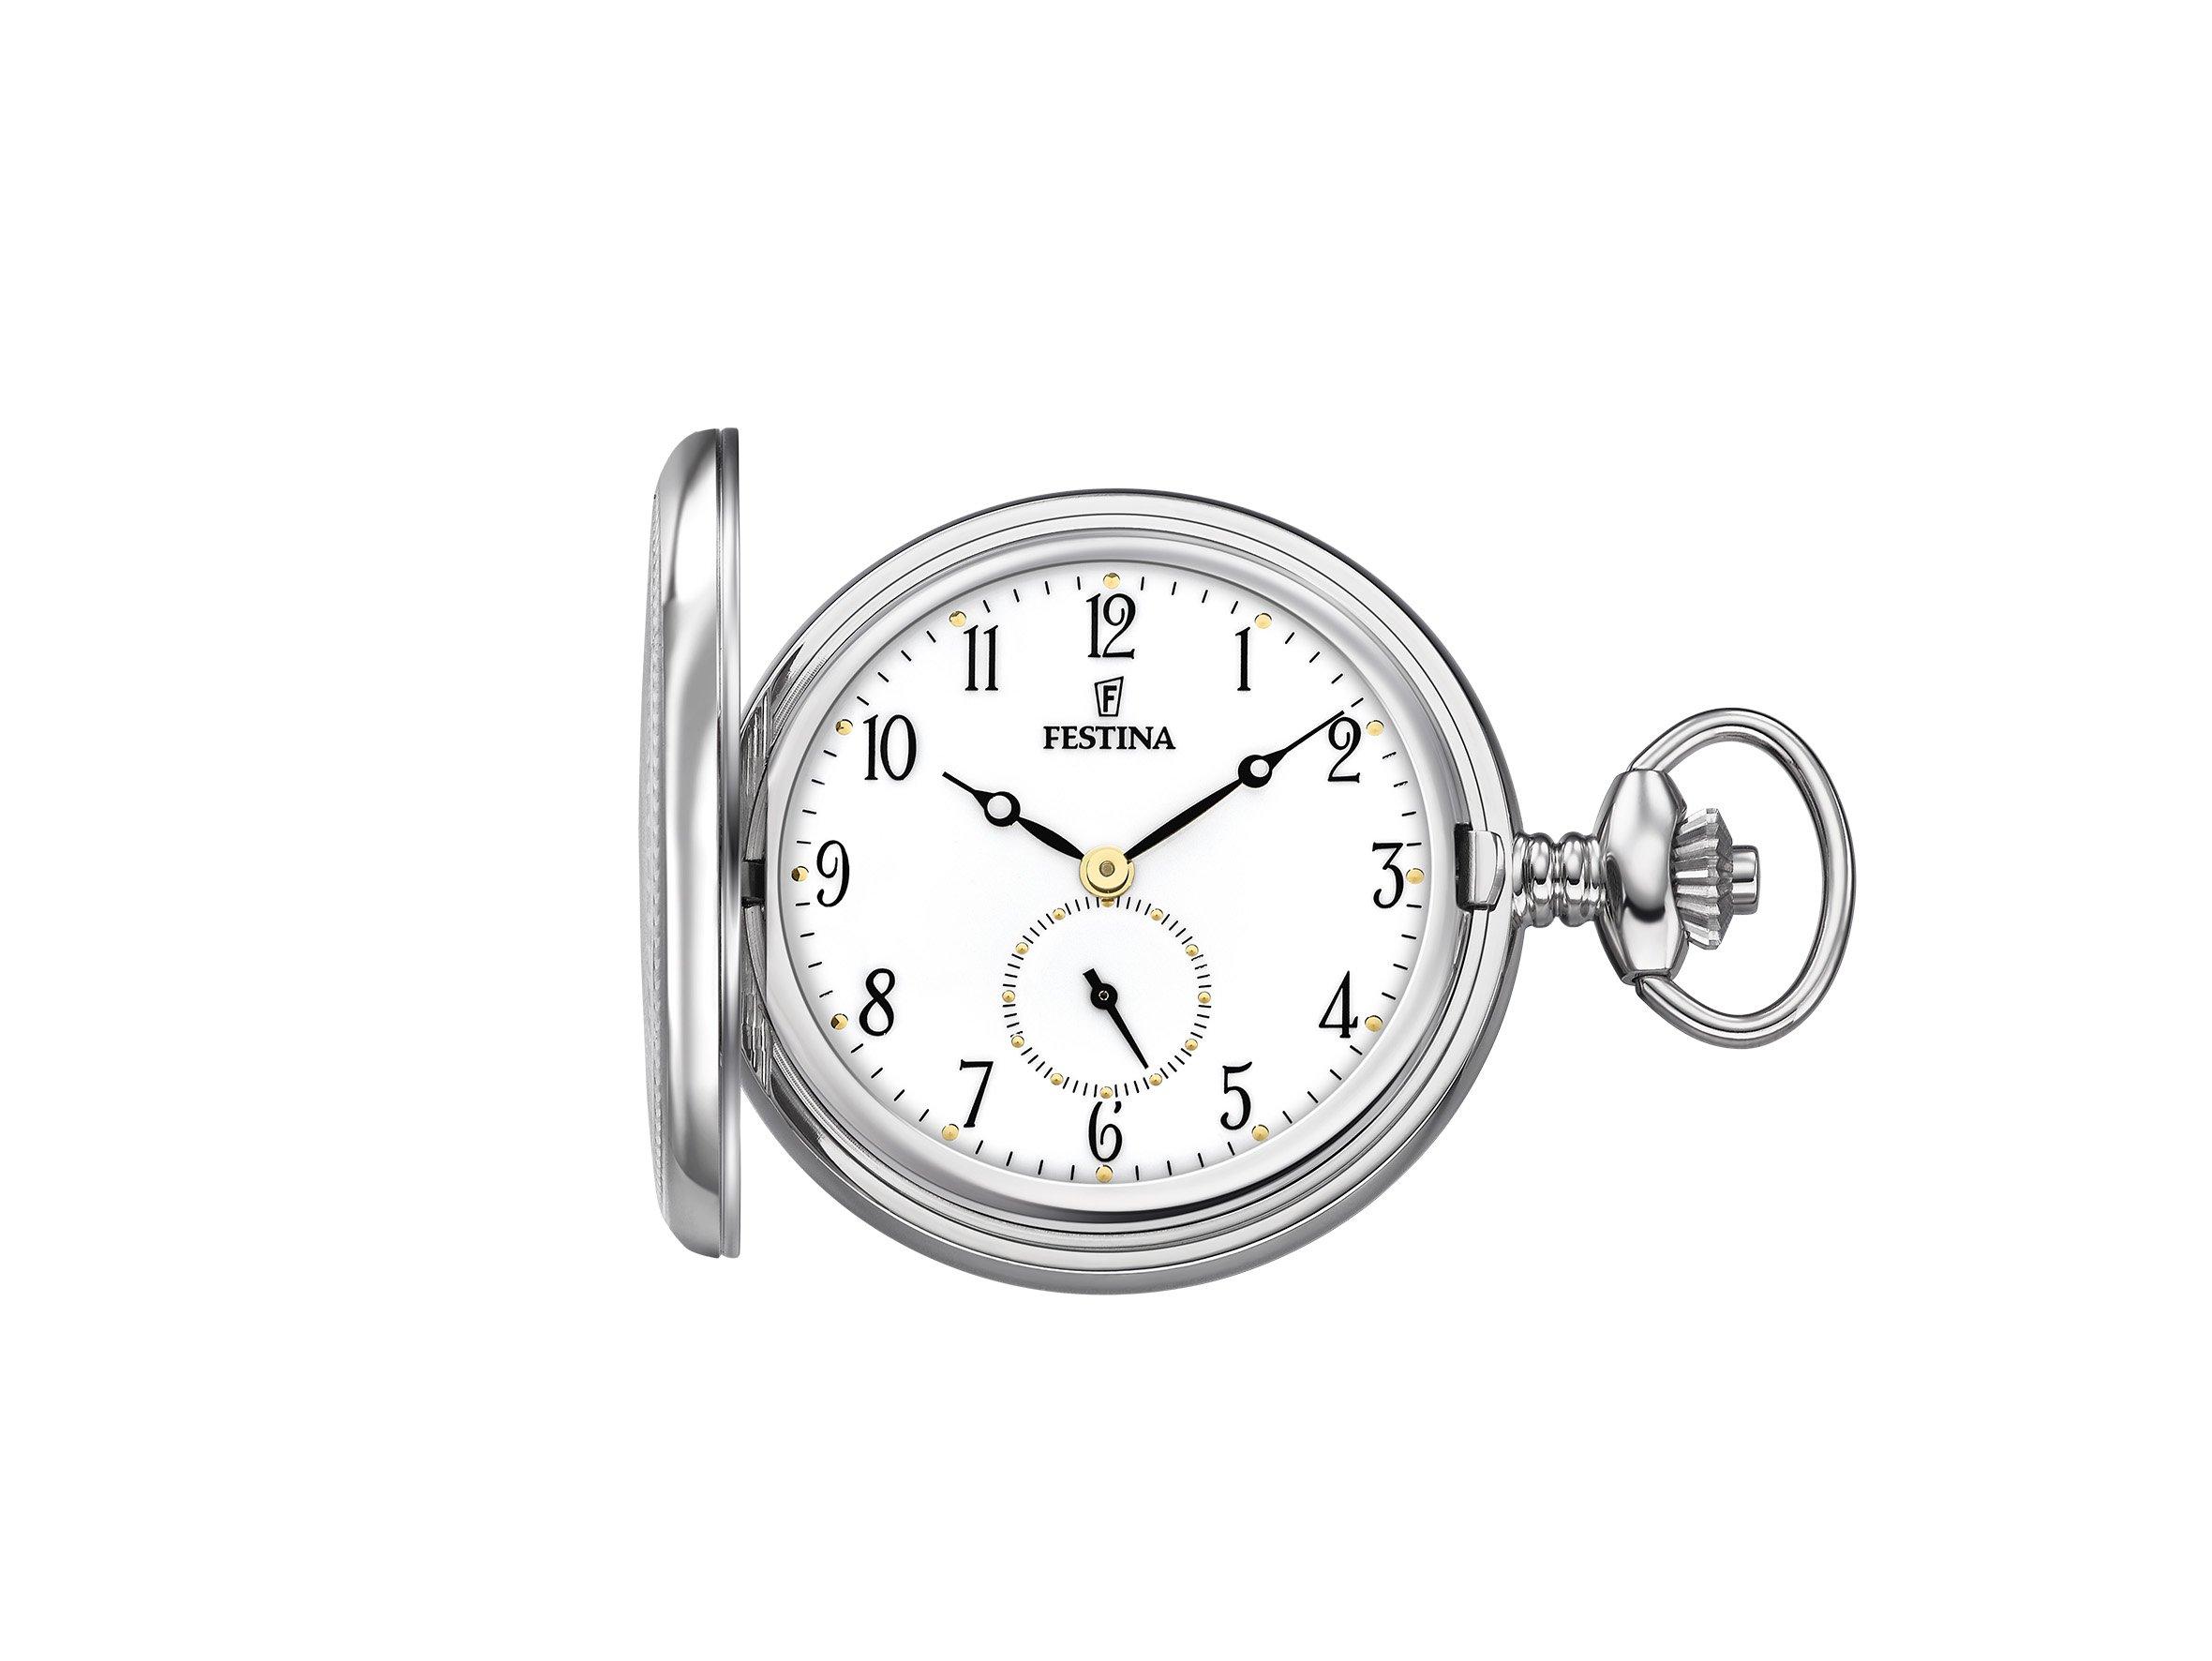 Festina Taschenuhr F2026/1 pocket watch by Festina